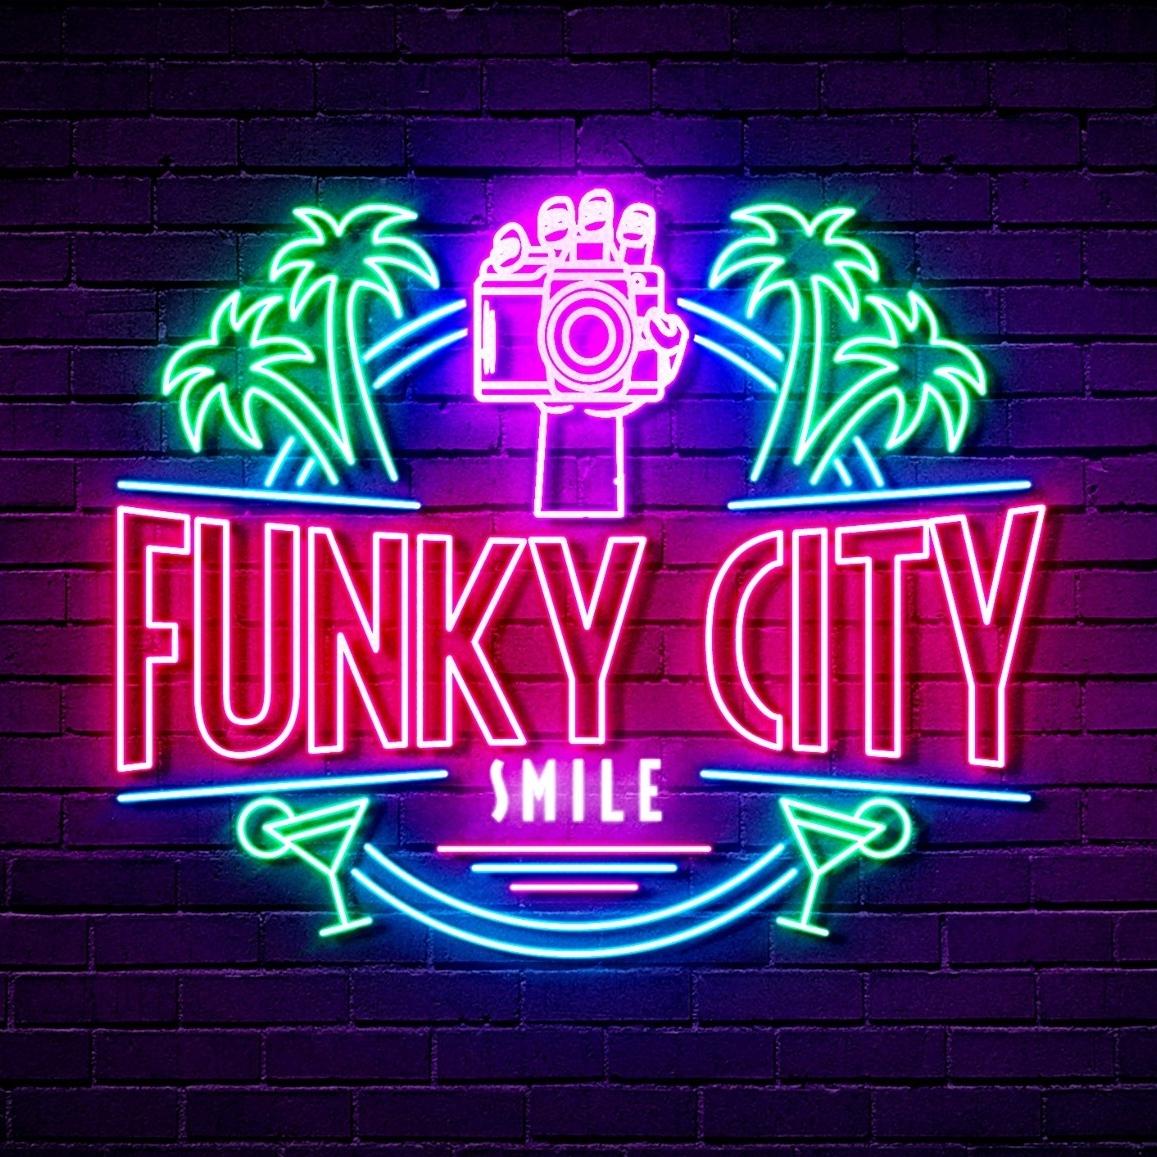 Funky City